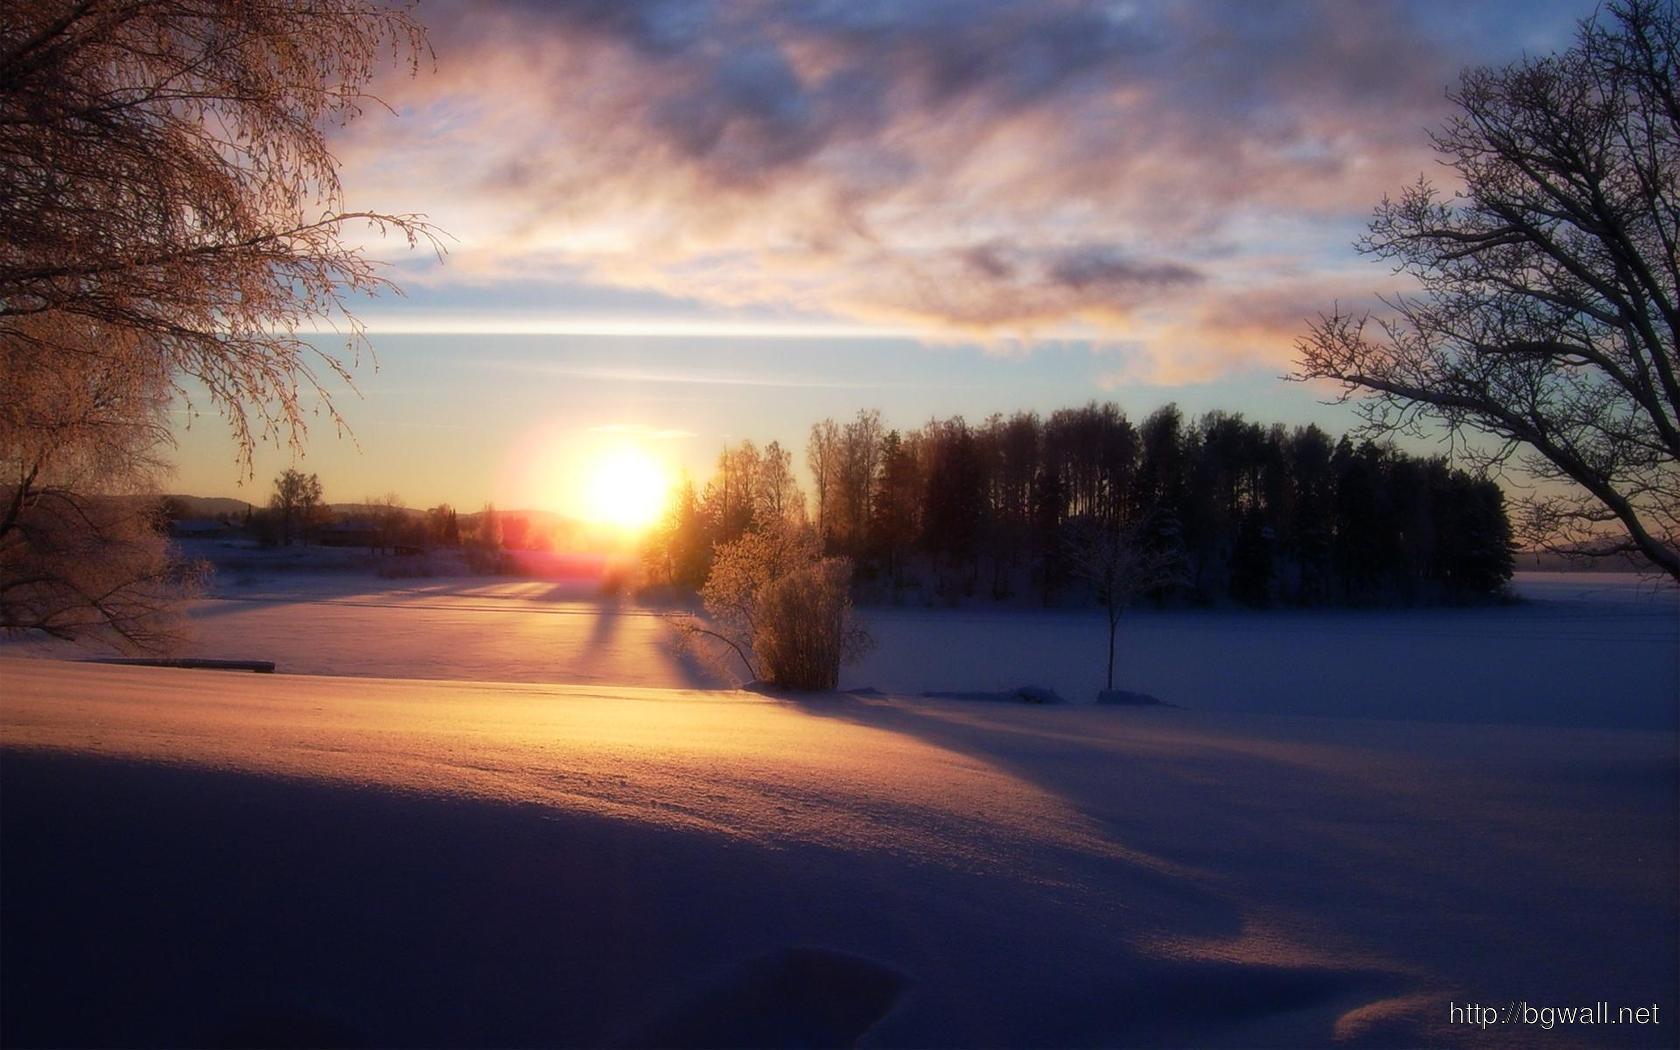 Storm City Wallpaper Hd 3d Sunset On Snowy Field Wallpaper 1188 Background Wallpaper Hd